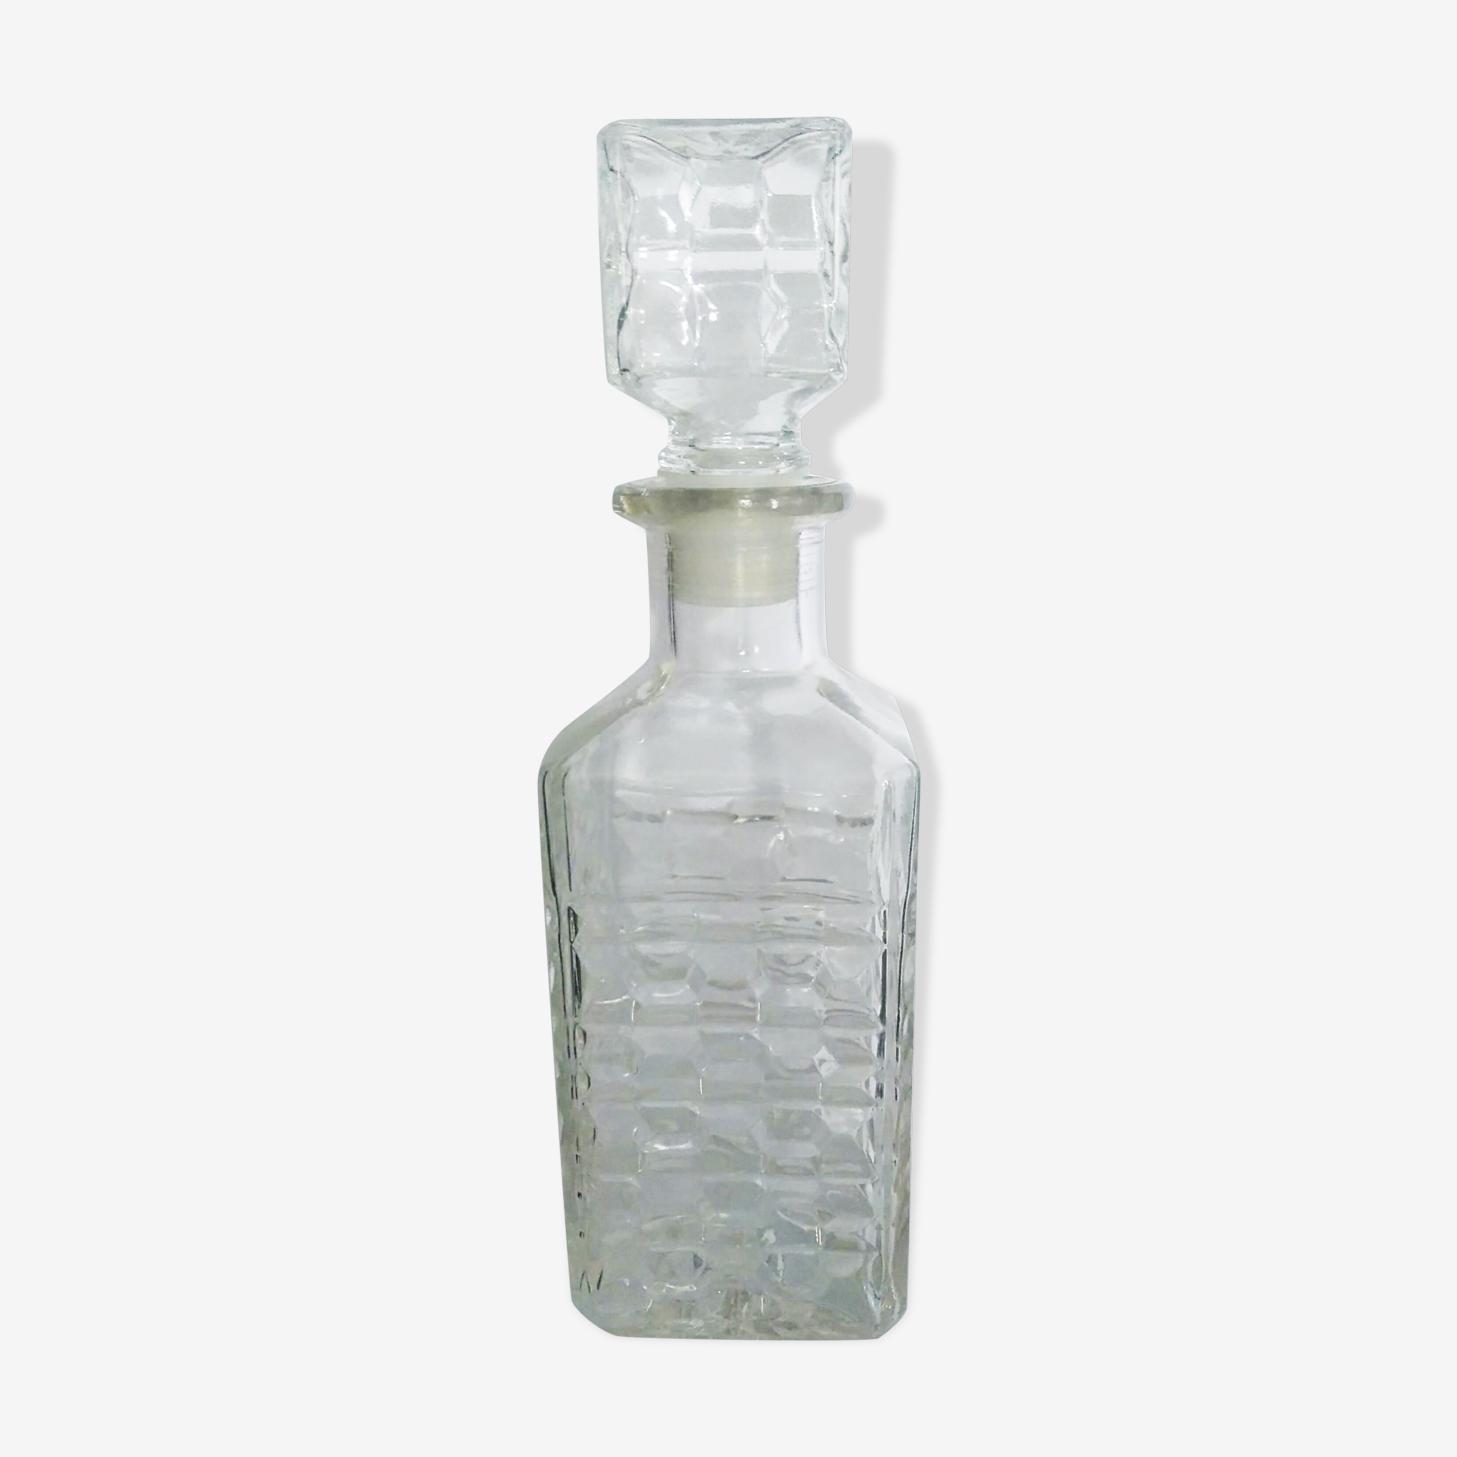 Vintage whiskey decanter